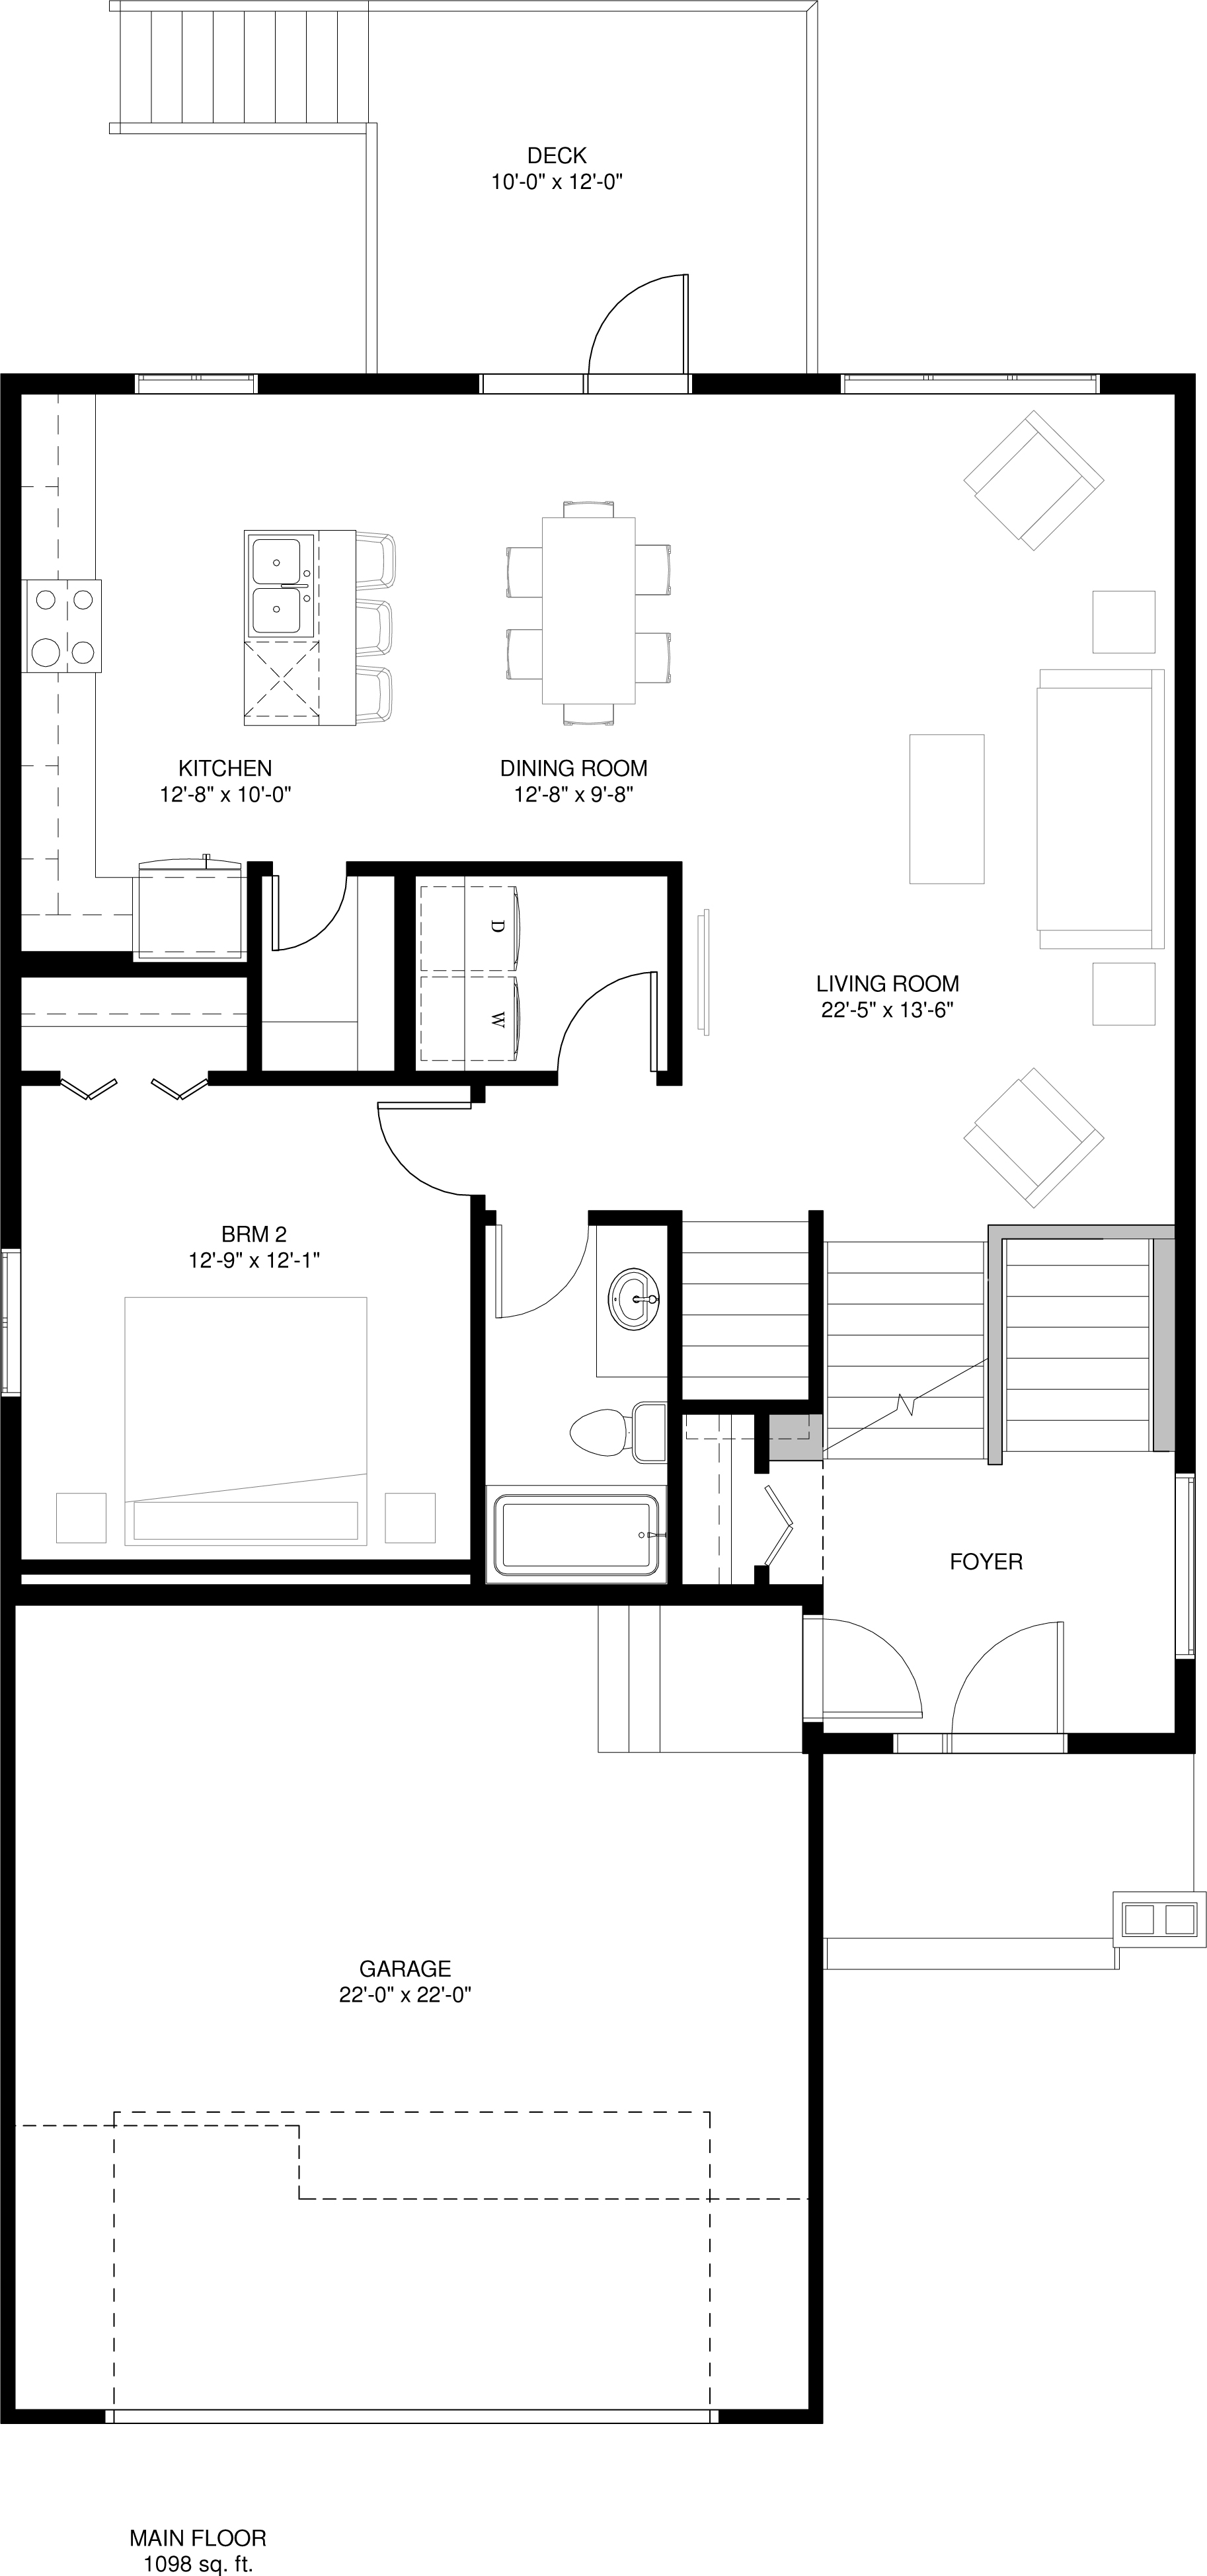 Optional Main Floor  - 2 bedrooms + Laundry Room 1098 sq ft